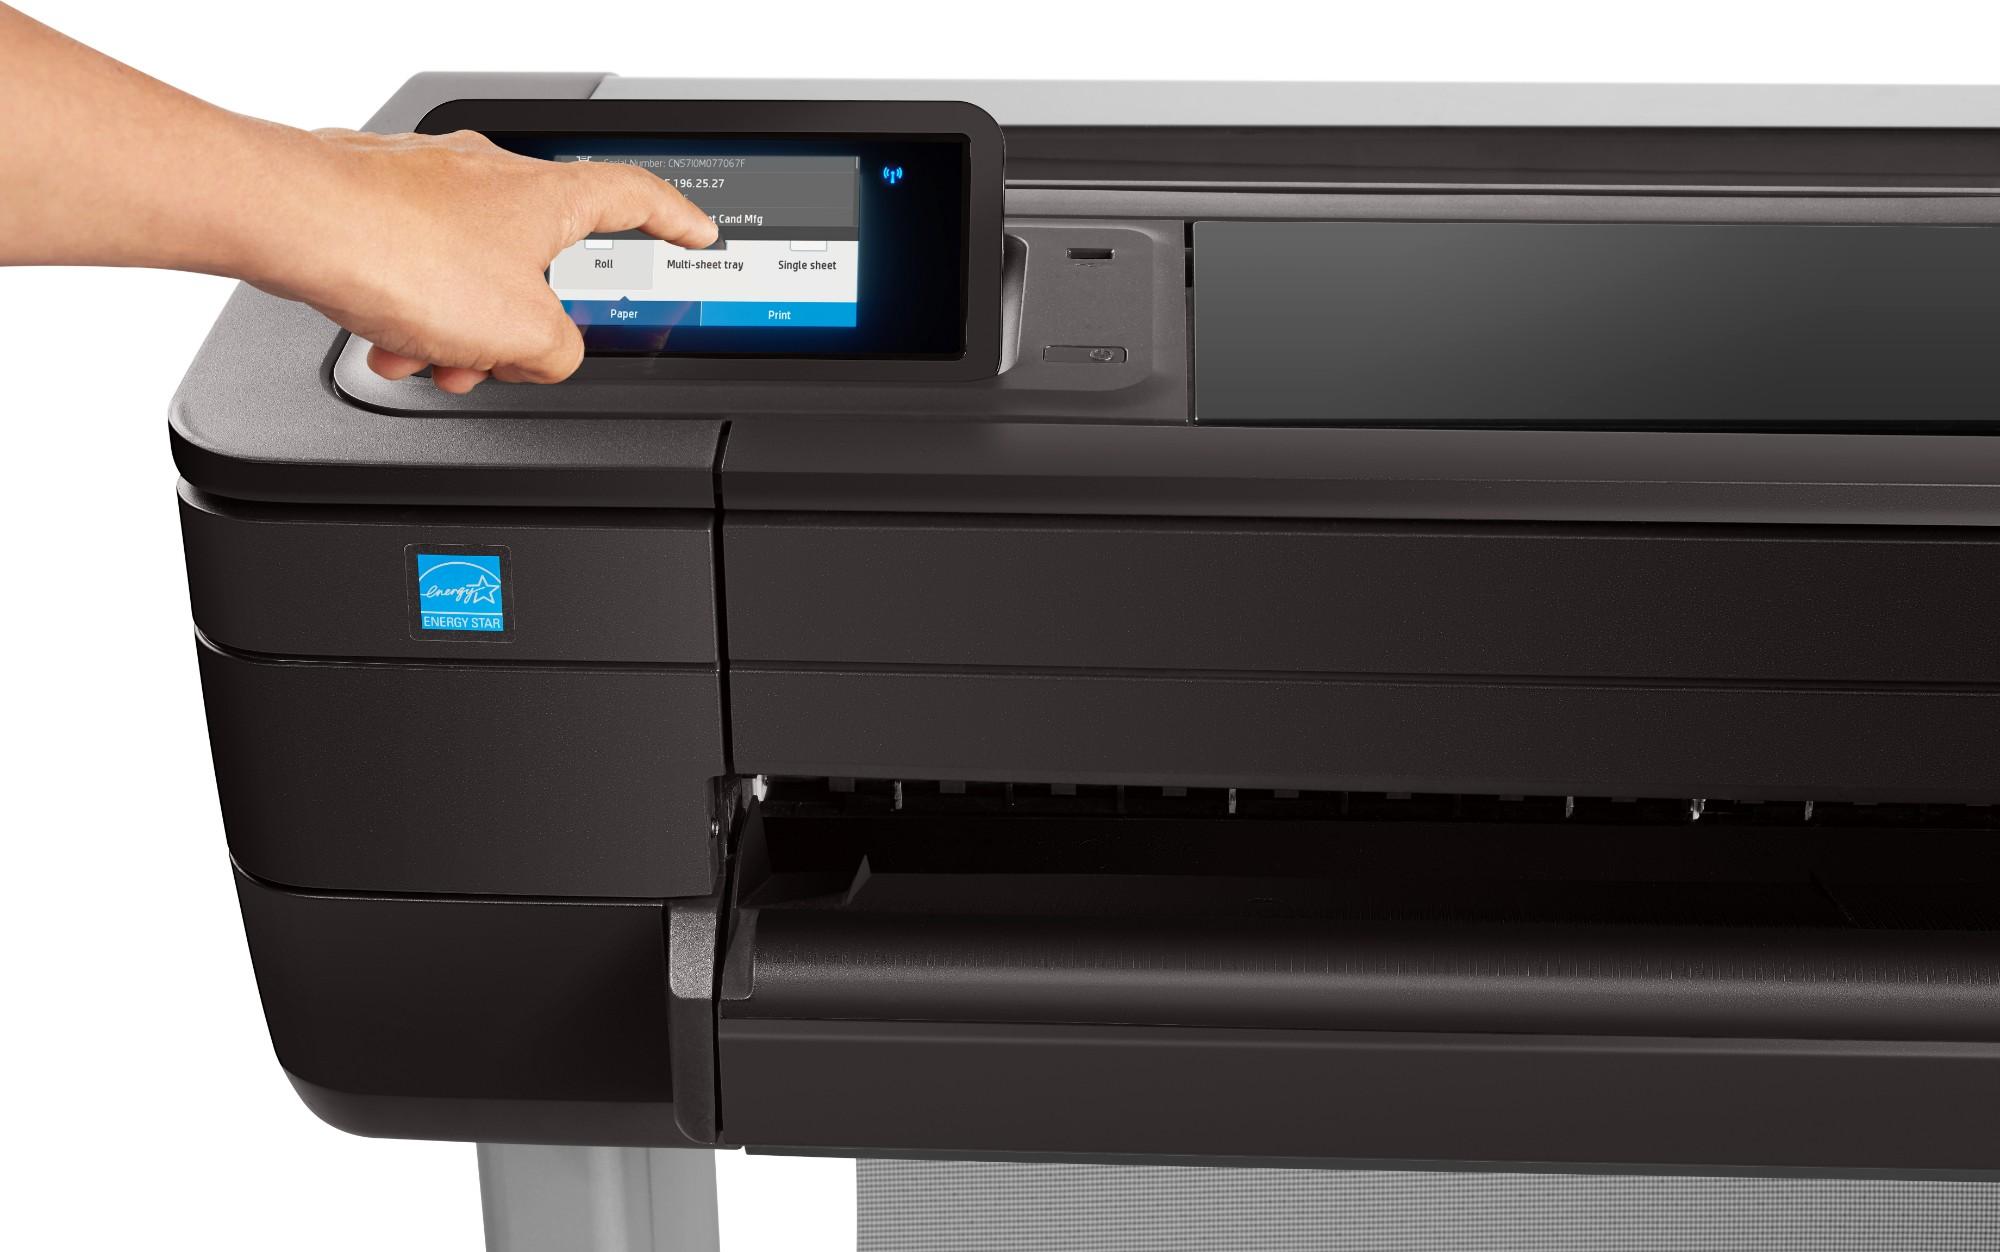 HP Designjet T730 36-in large format printer Colour 2400 x 1200 DPI Thermal inkjet A0 (841 x 1189 mm) Wi-Fi